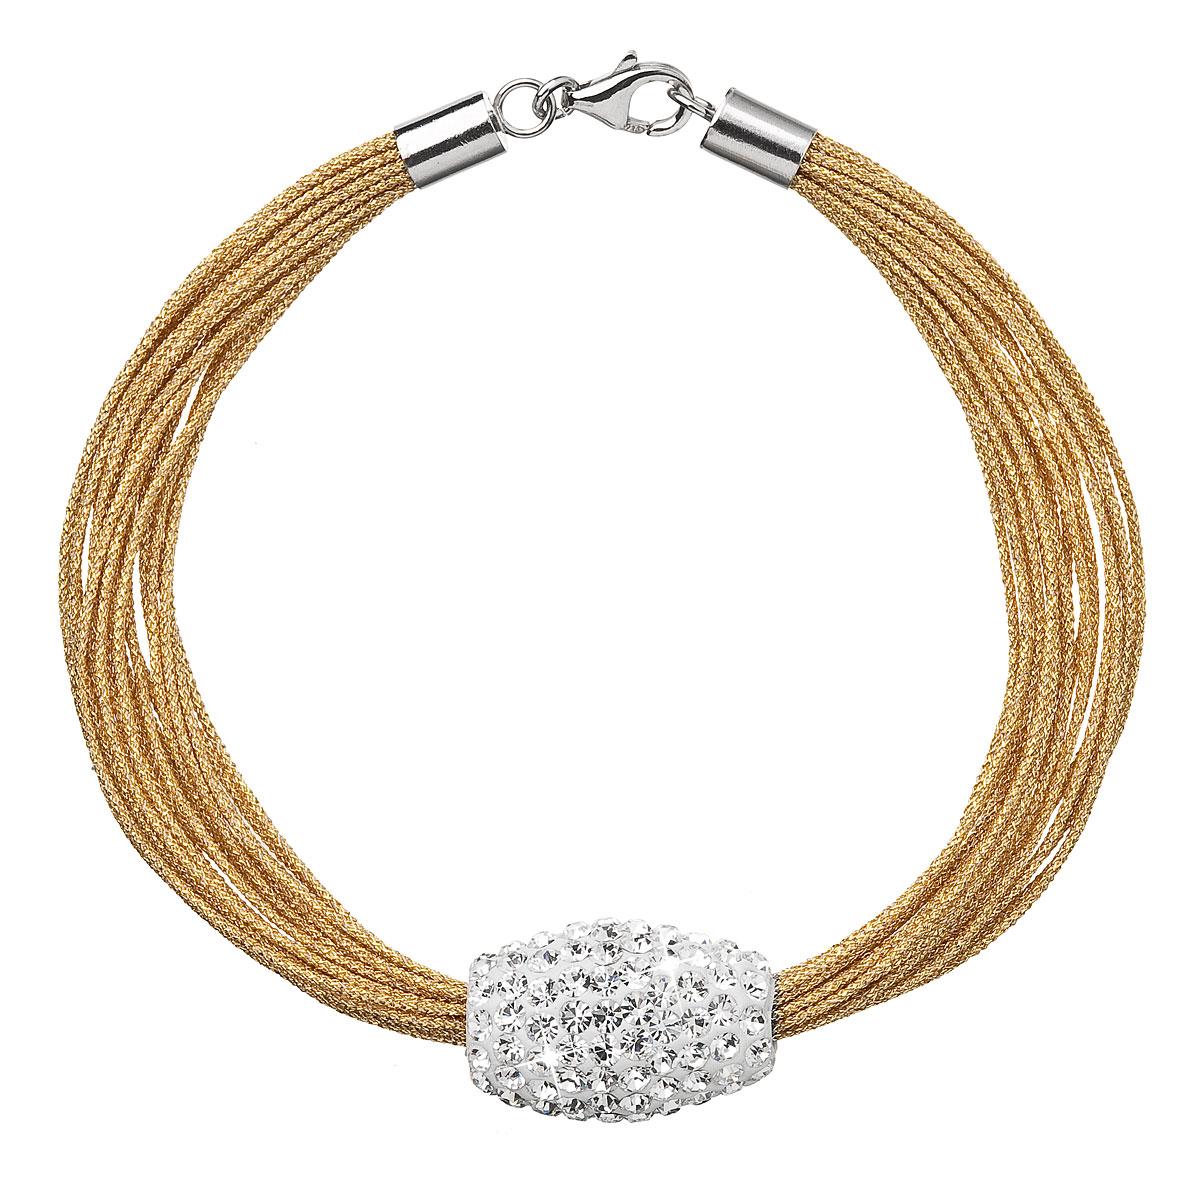 Stříbrný náramek s krystaly bílo zlatý 33072.3 gold